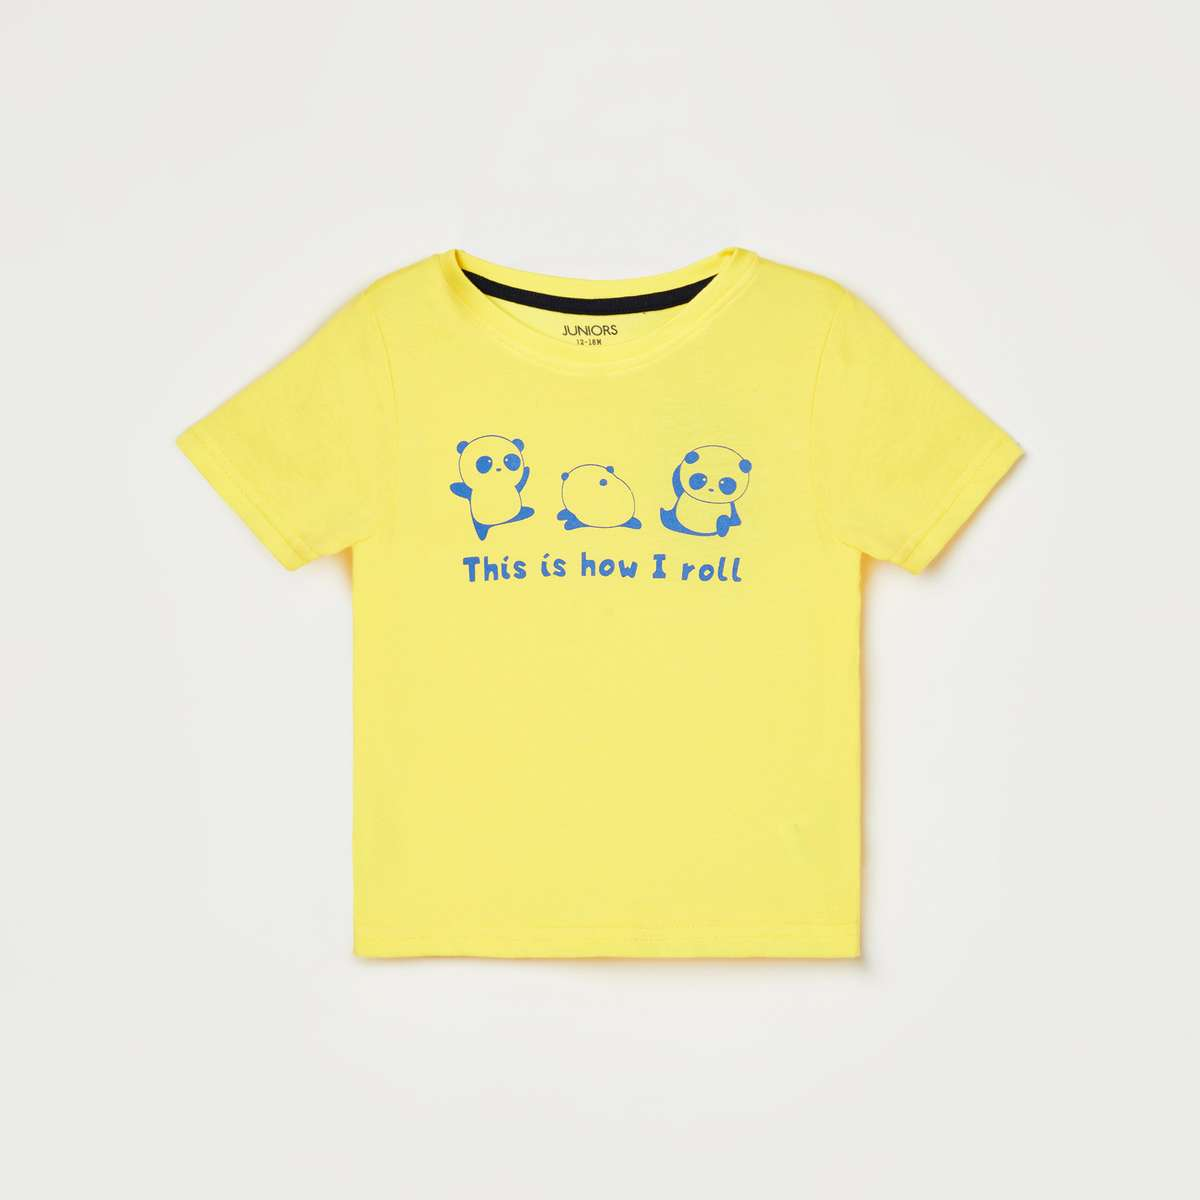 3.JUNIORS Boys Typographic Print Round Neck T-shirt